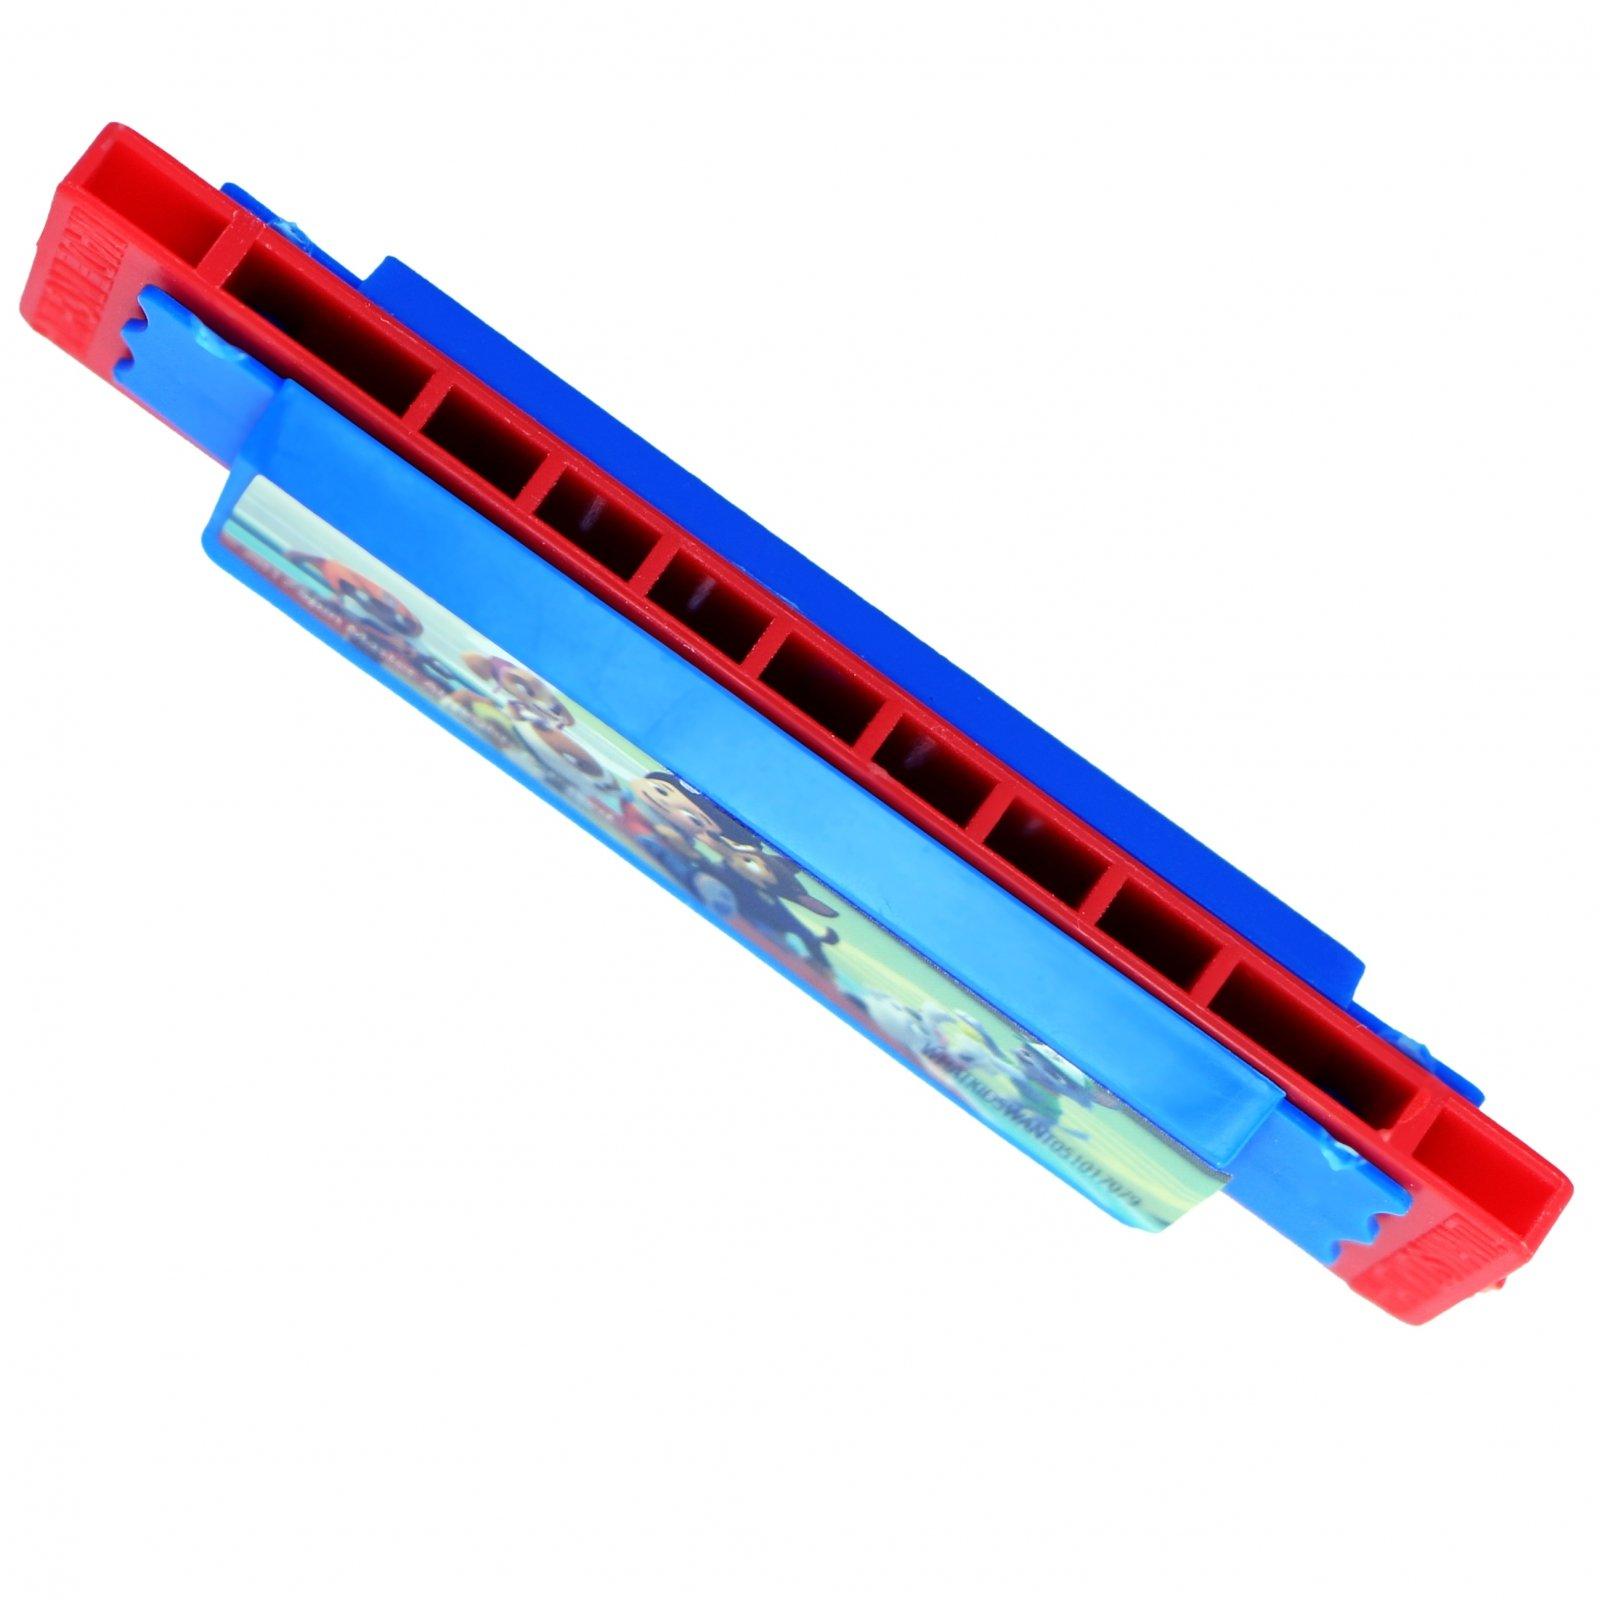 Nickelodeon Paw Patrol Boys Mini Harmonicas Kids Musical Instrument Toys - Red